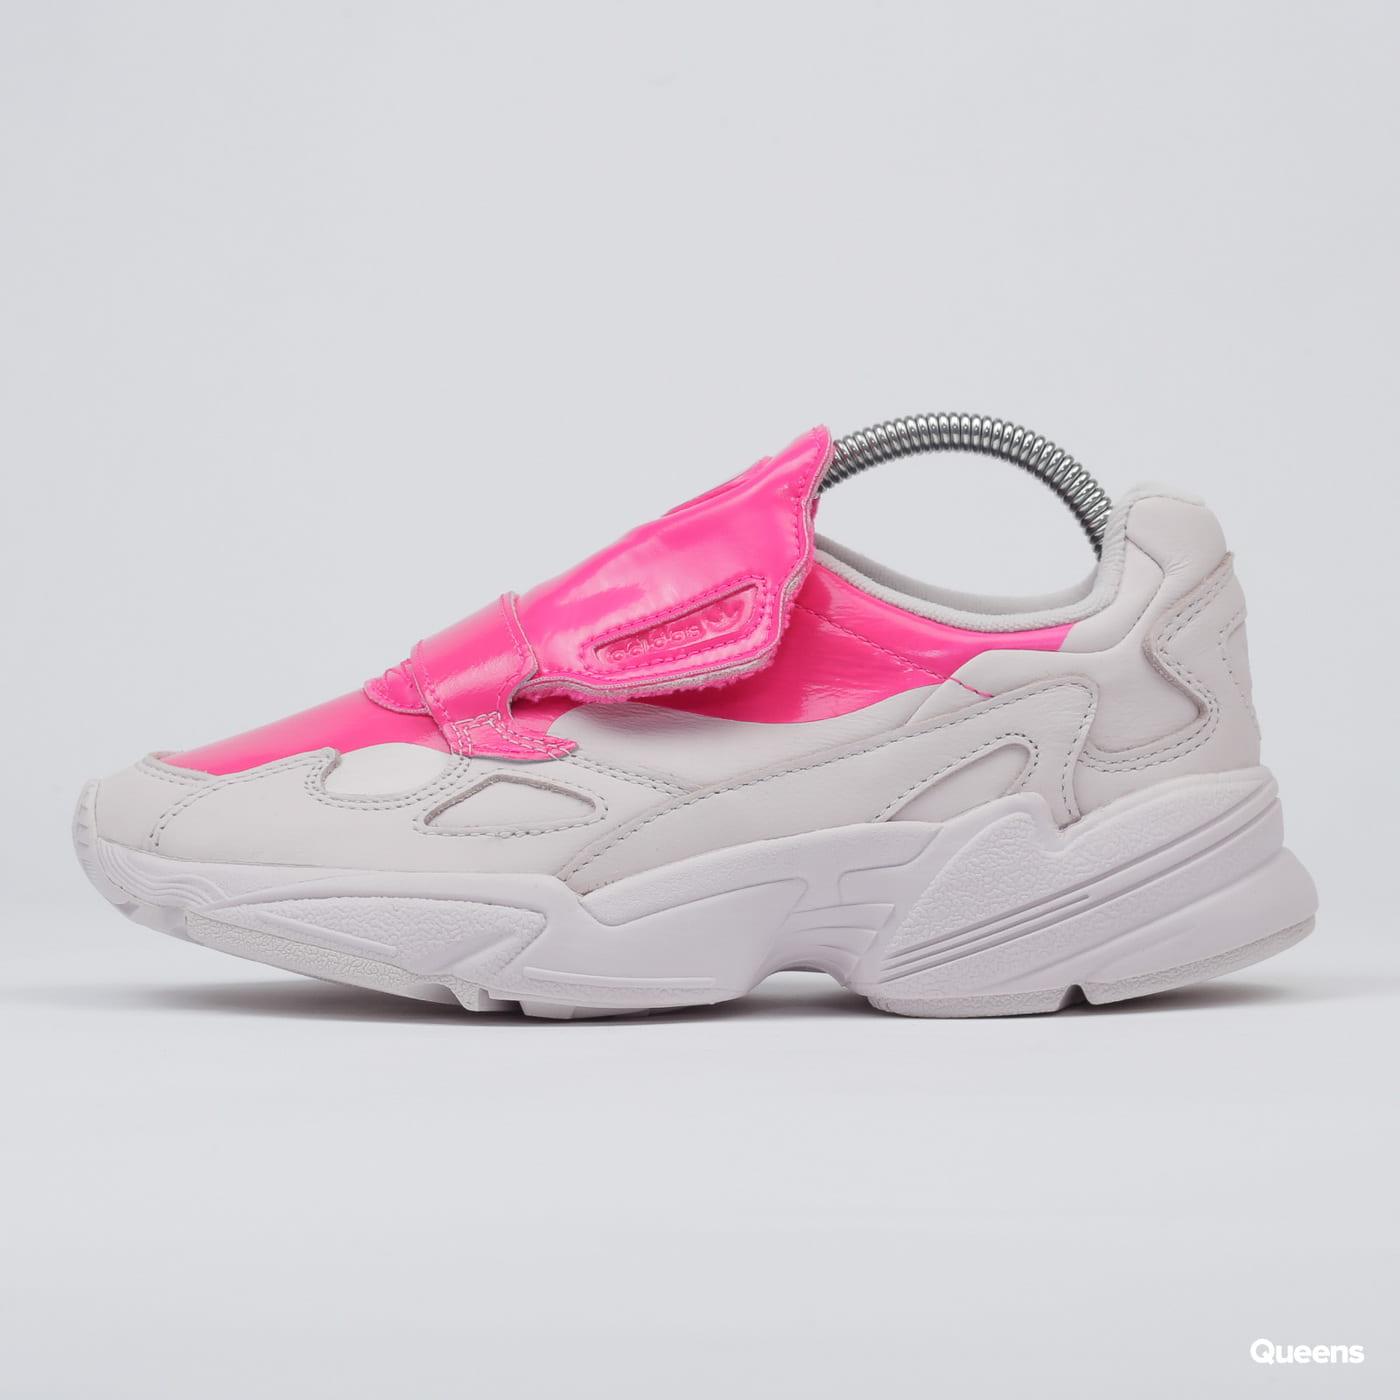 adidas Originals Falcon RX W shopink / shopink / orctin